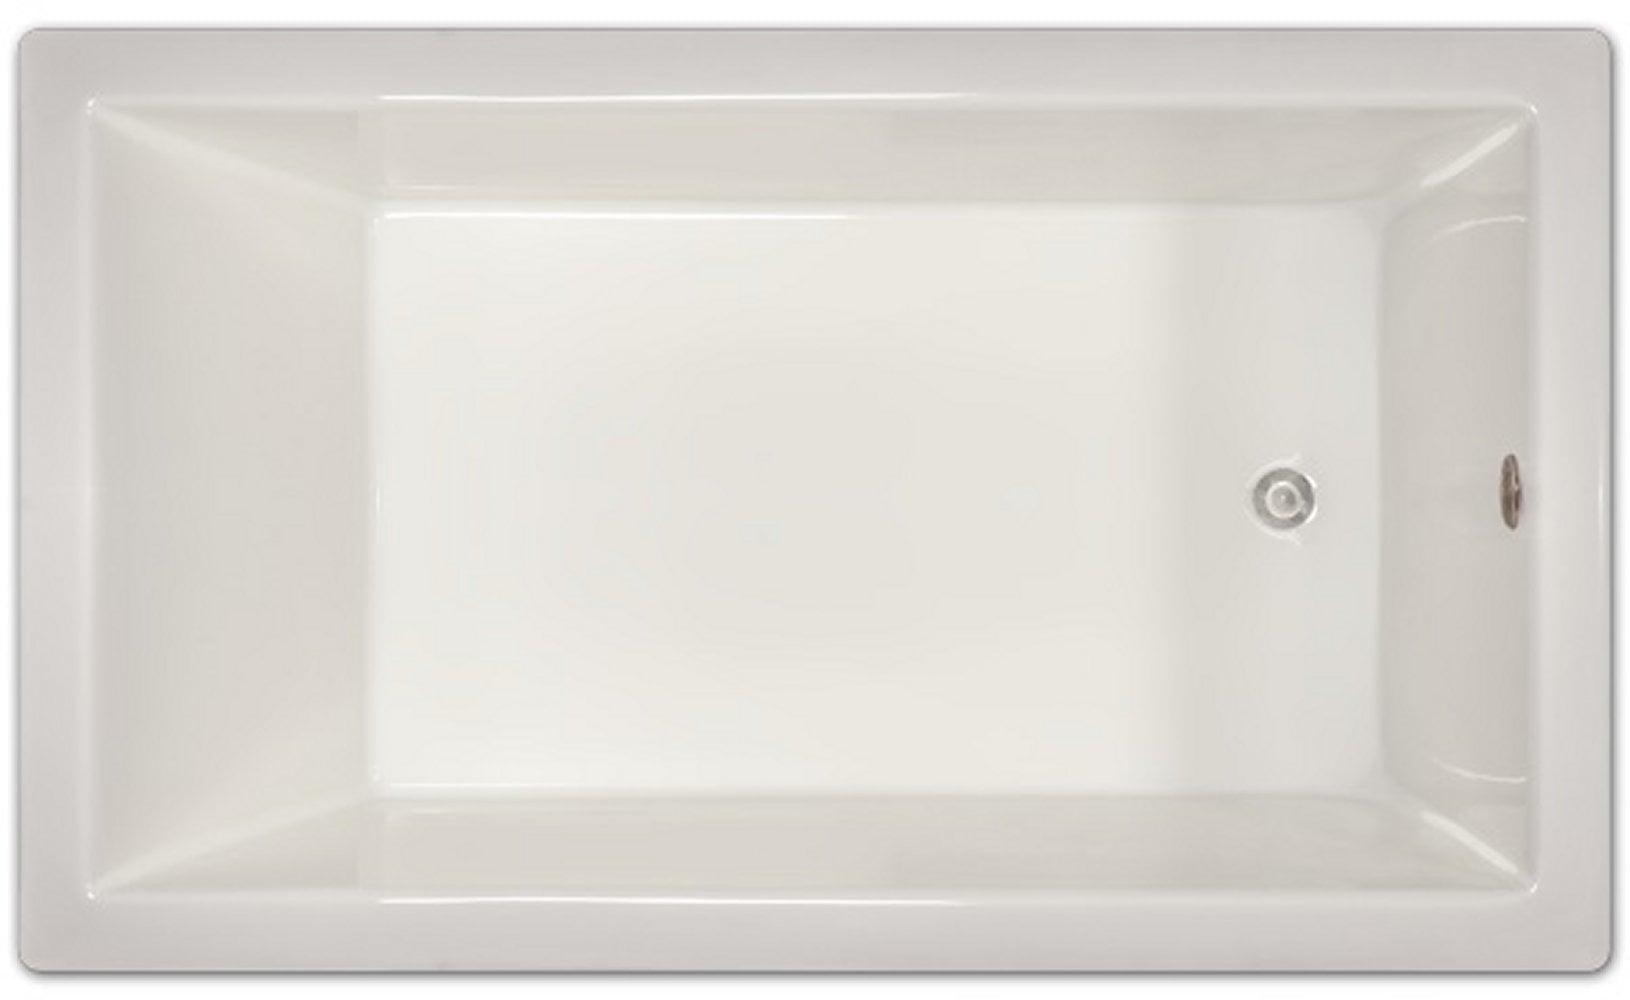 Drop-in Bathtub / 72x42x18 / high gloss white acrylic / Rectangle / LPI228-S Pinnacle Bath - Soaker 0